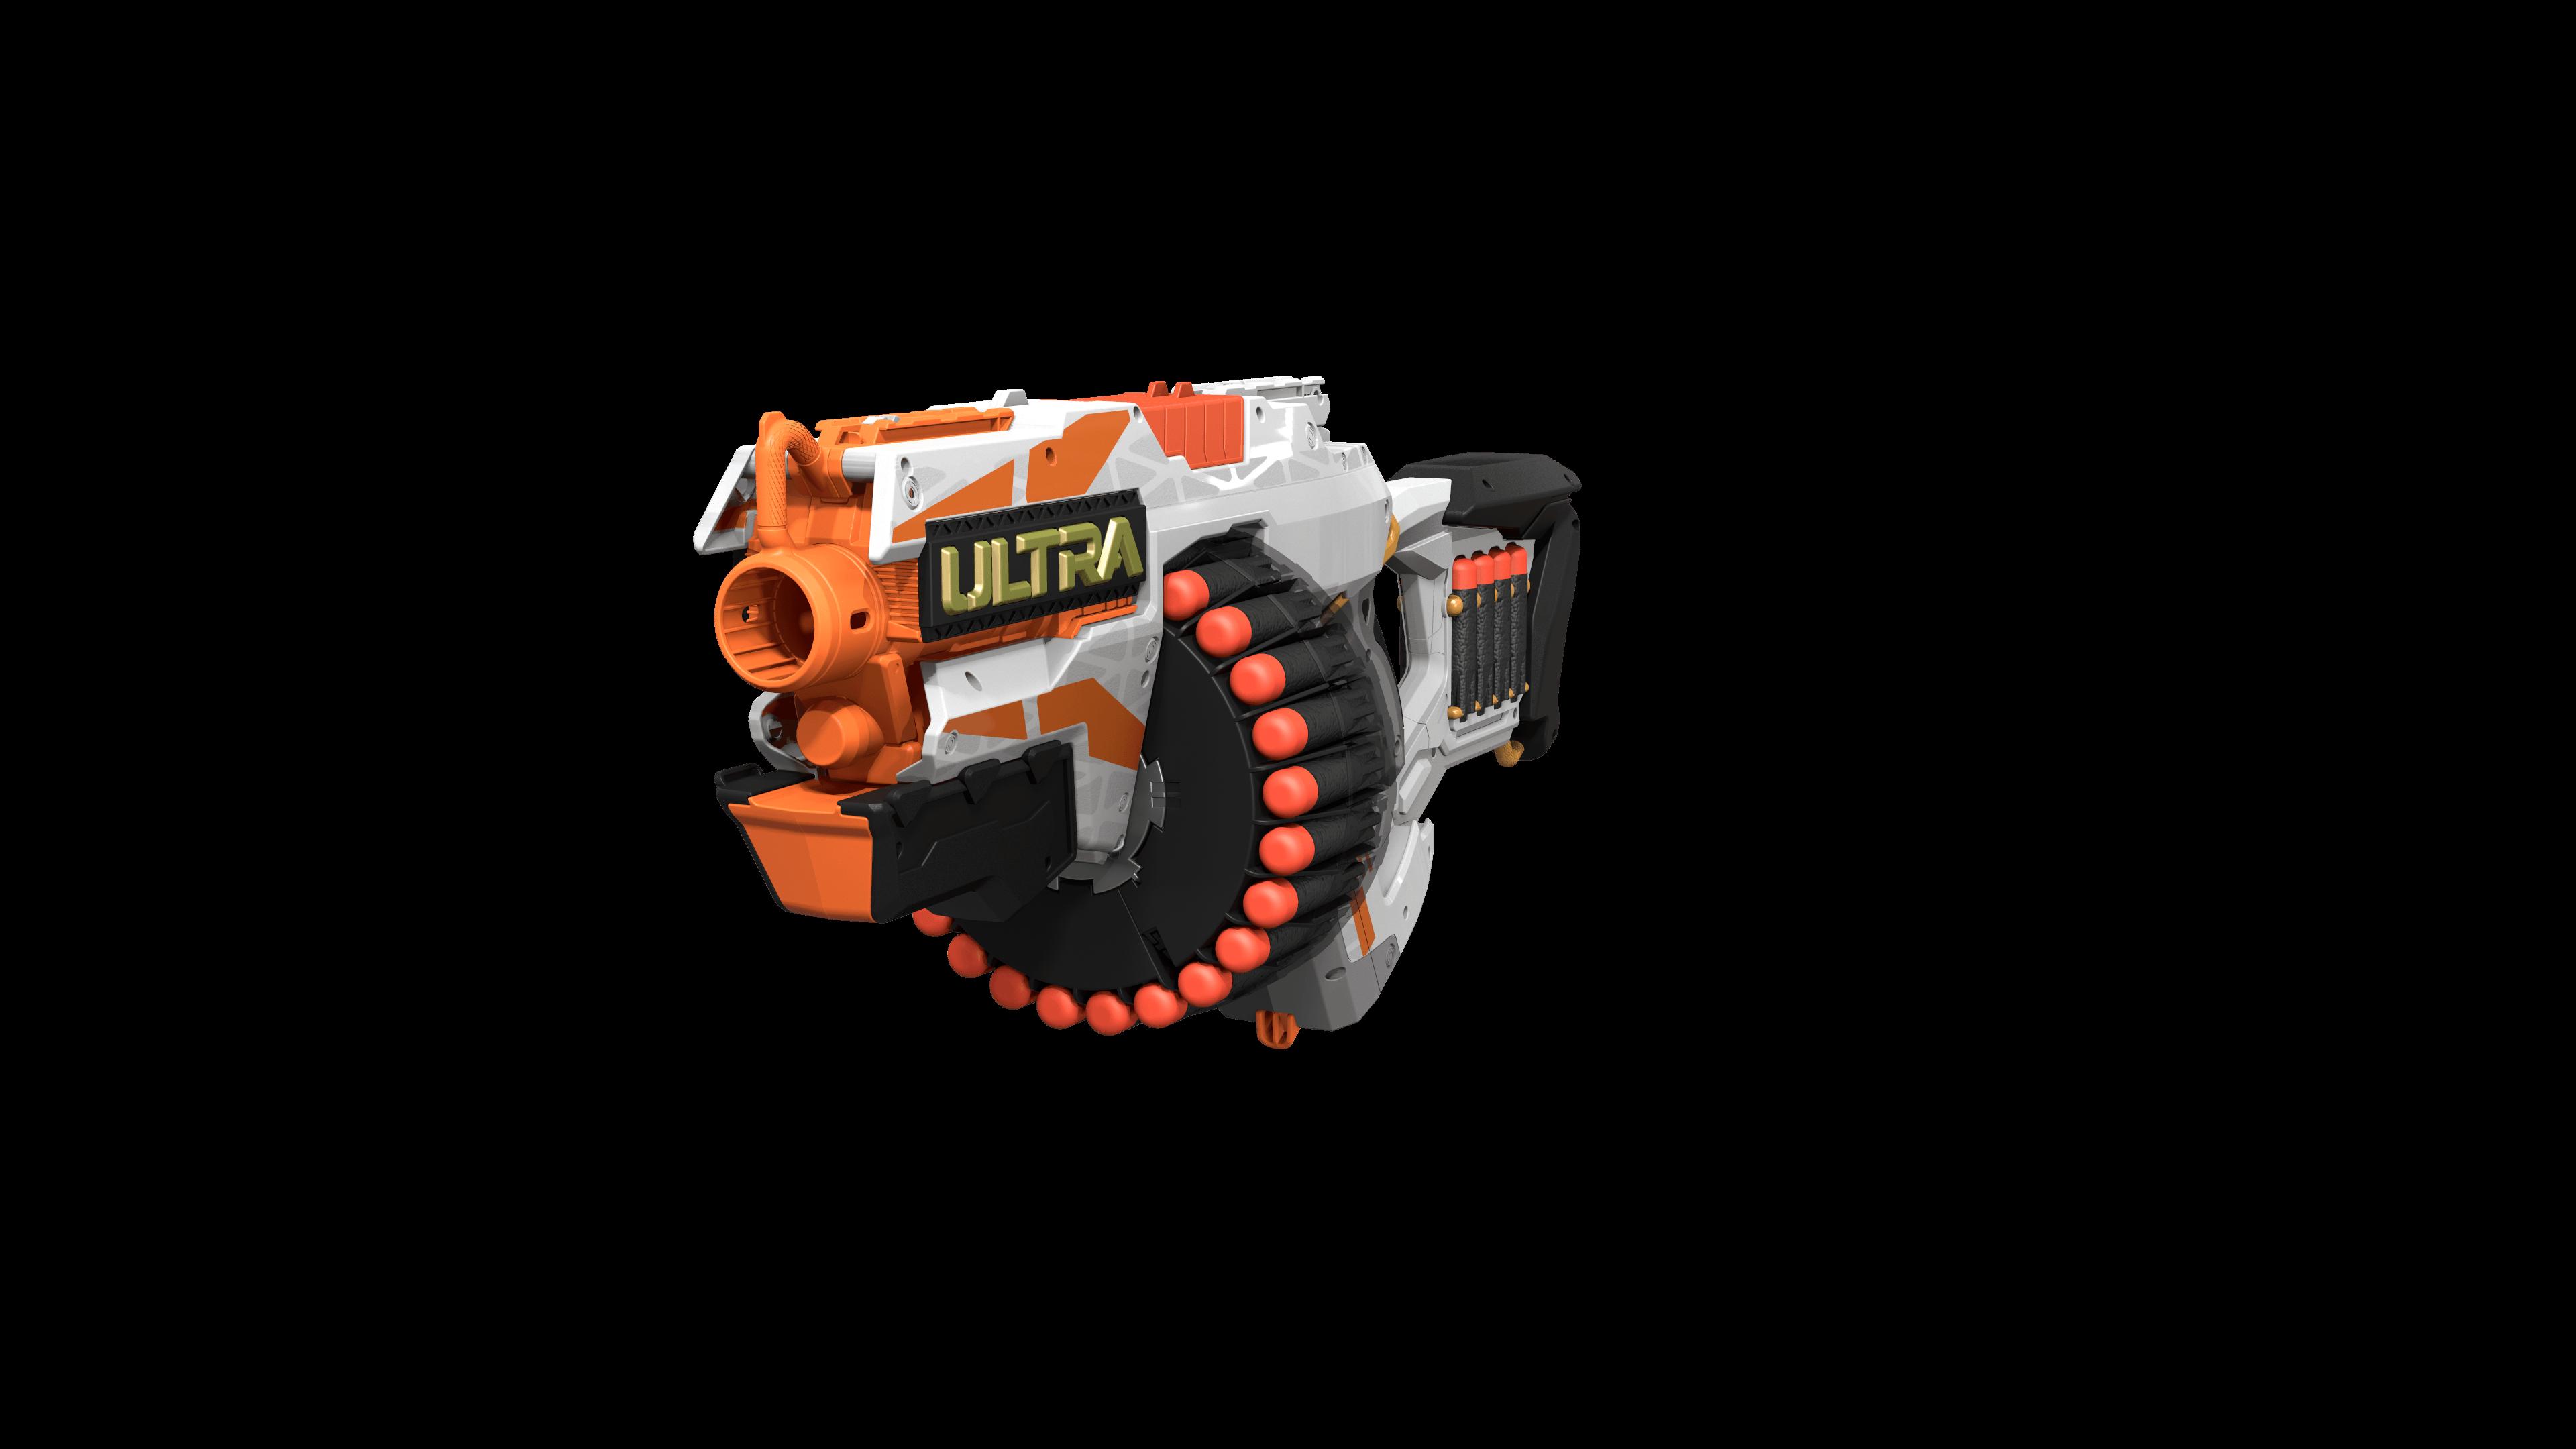 ultra blaster img 83